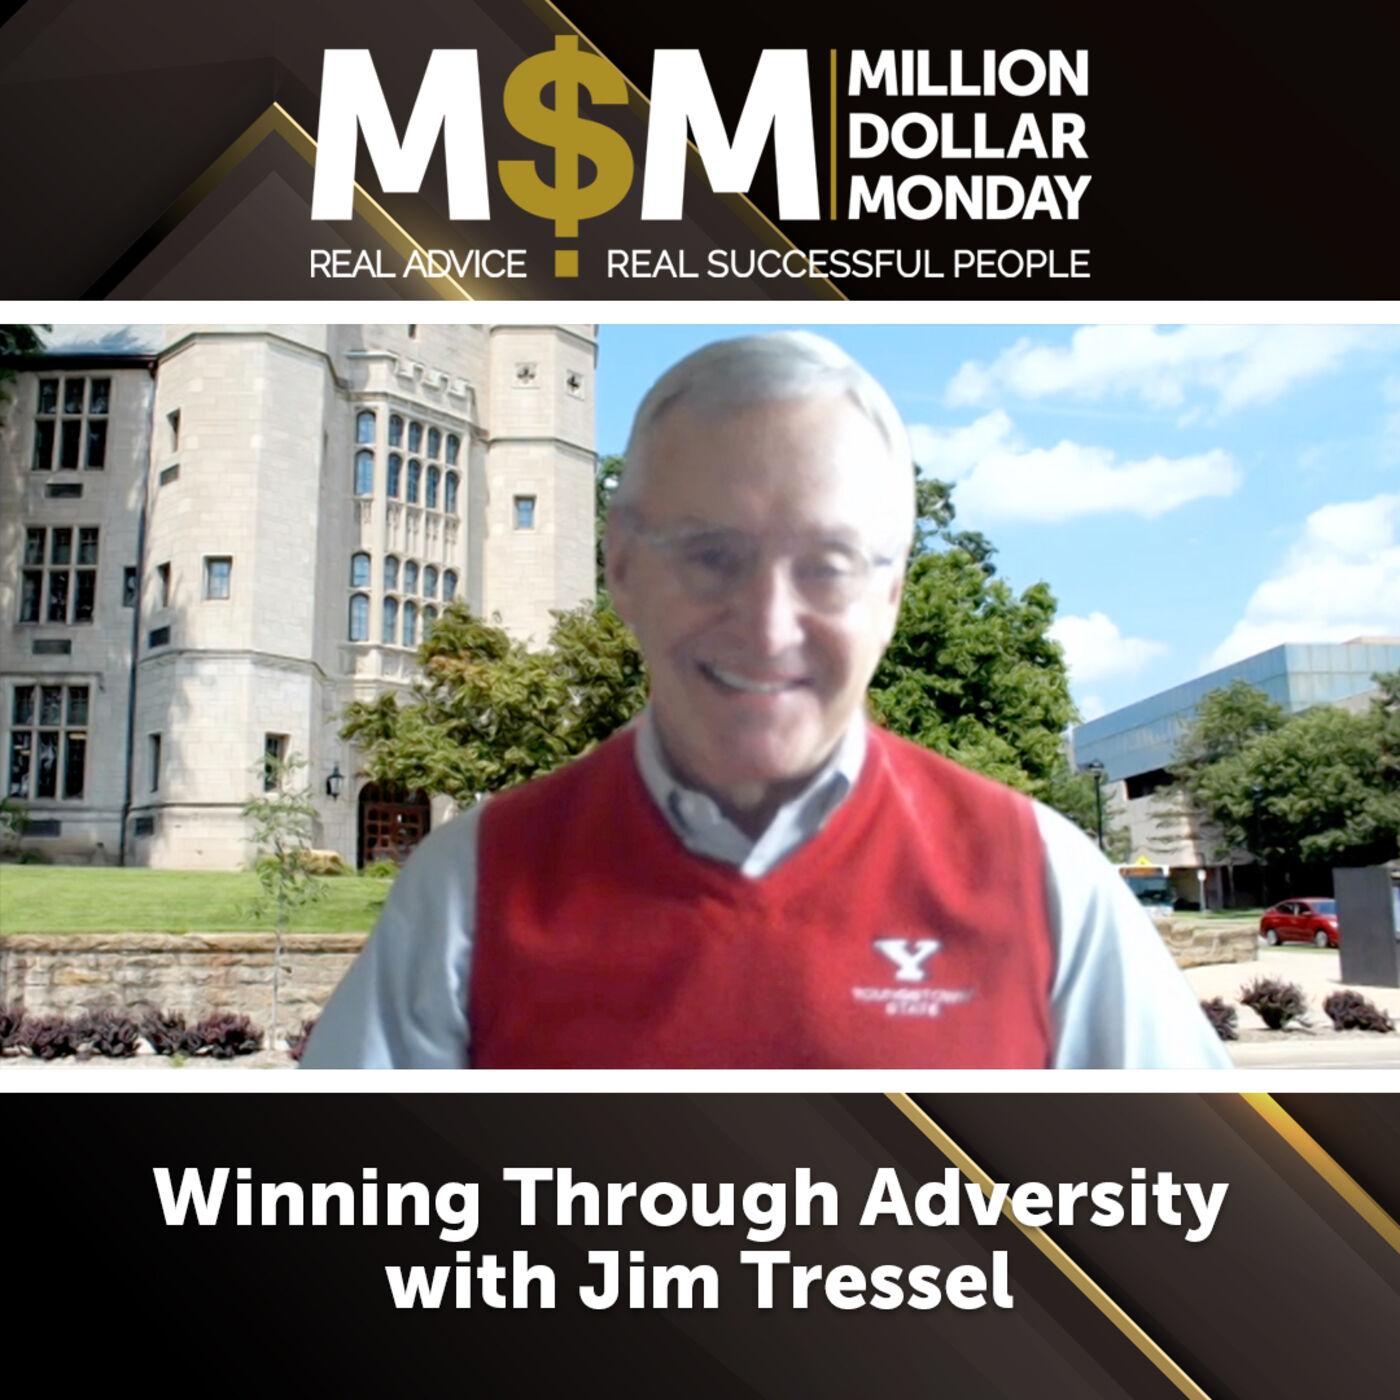 Winning Through Adversity with Jim Tressel